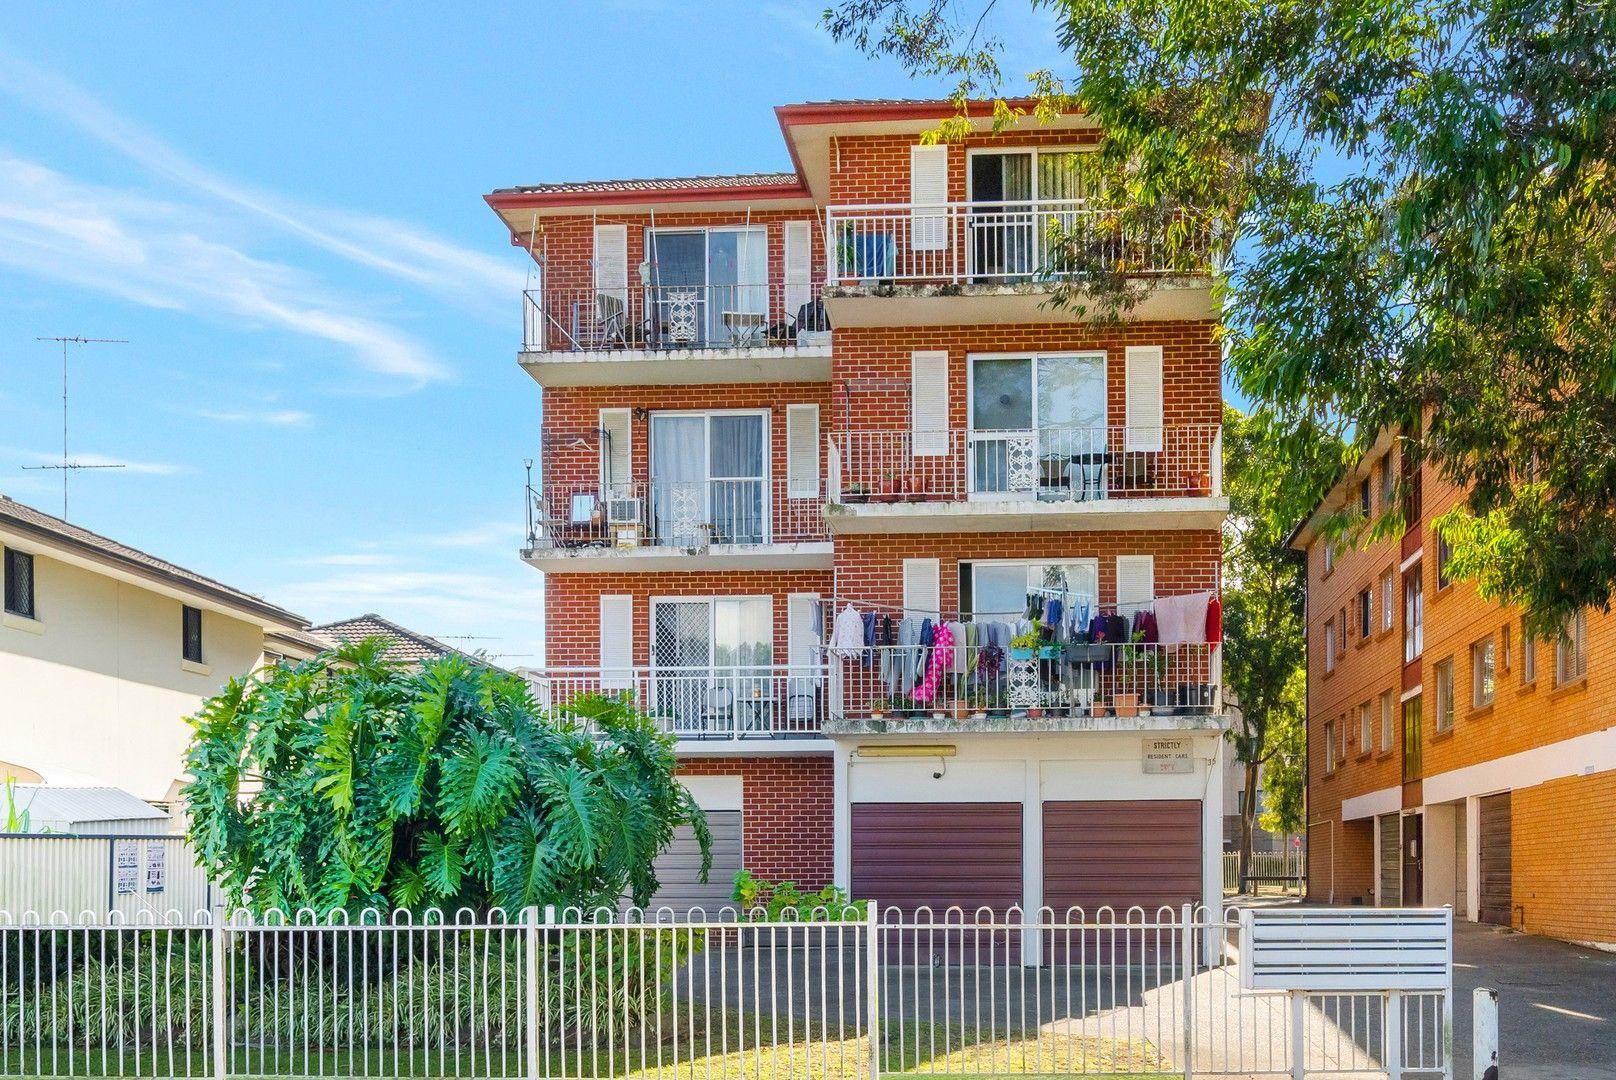 11/35 Carramar Avenue, Carramar NSW 2163, Image 0